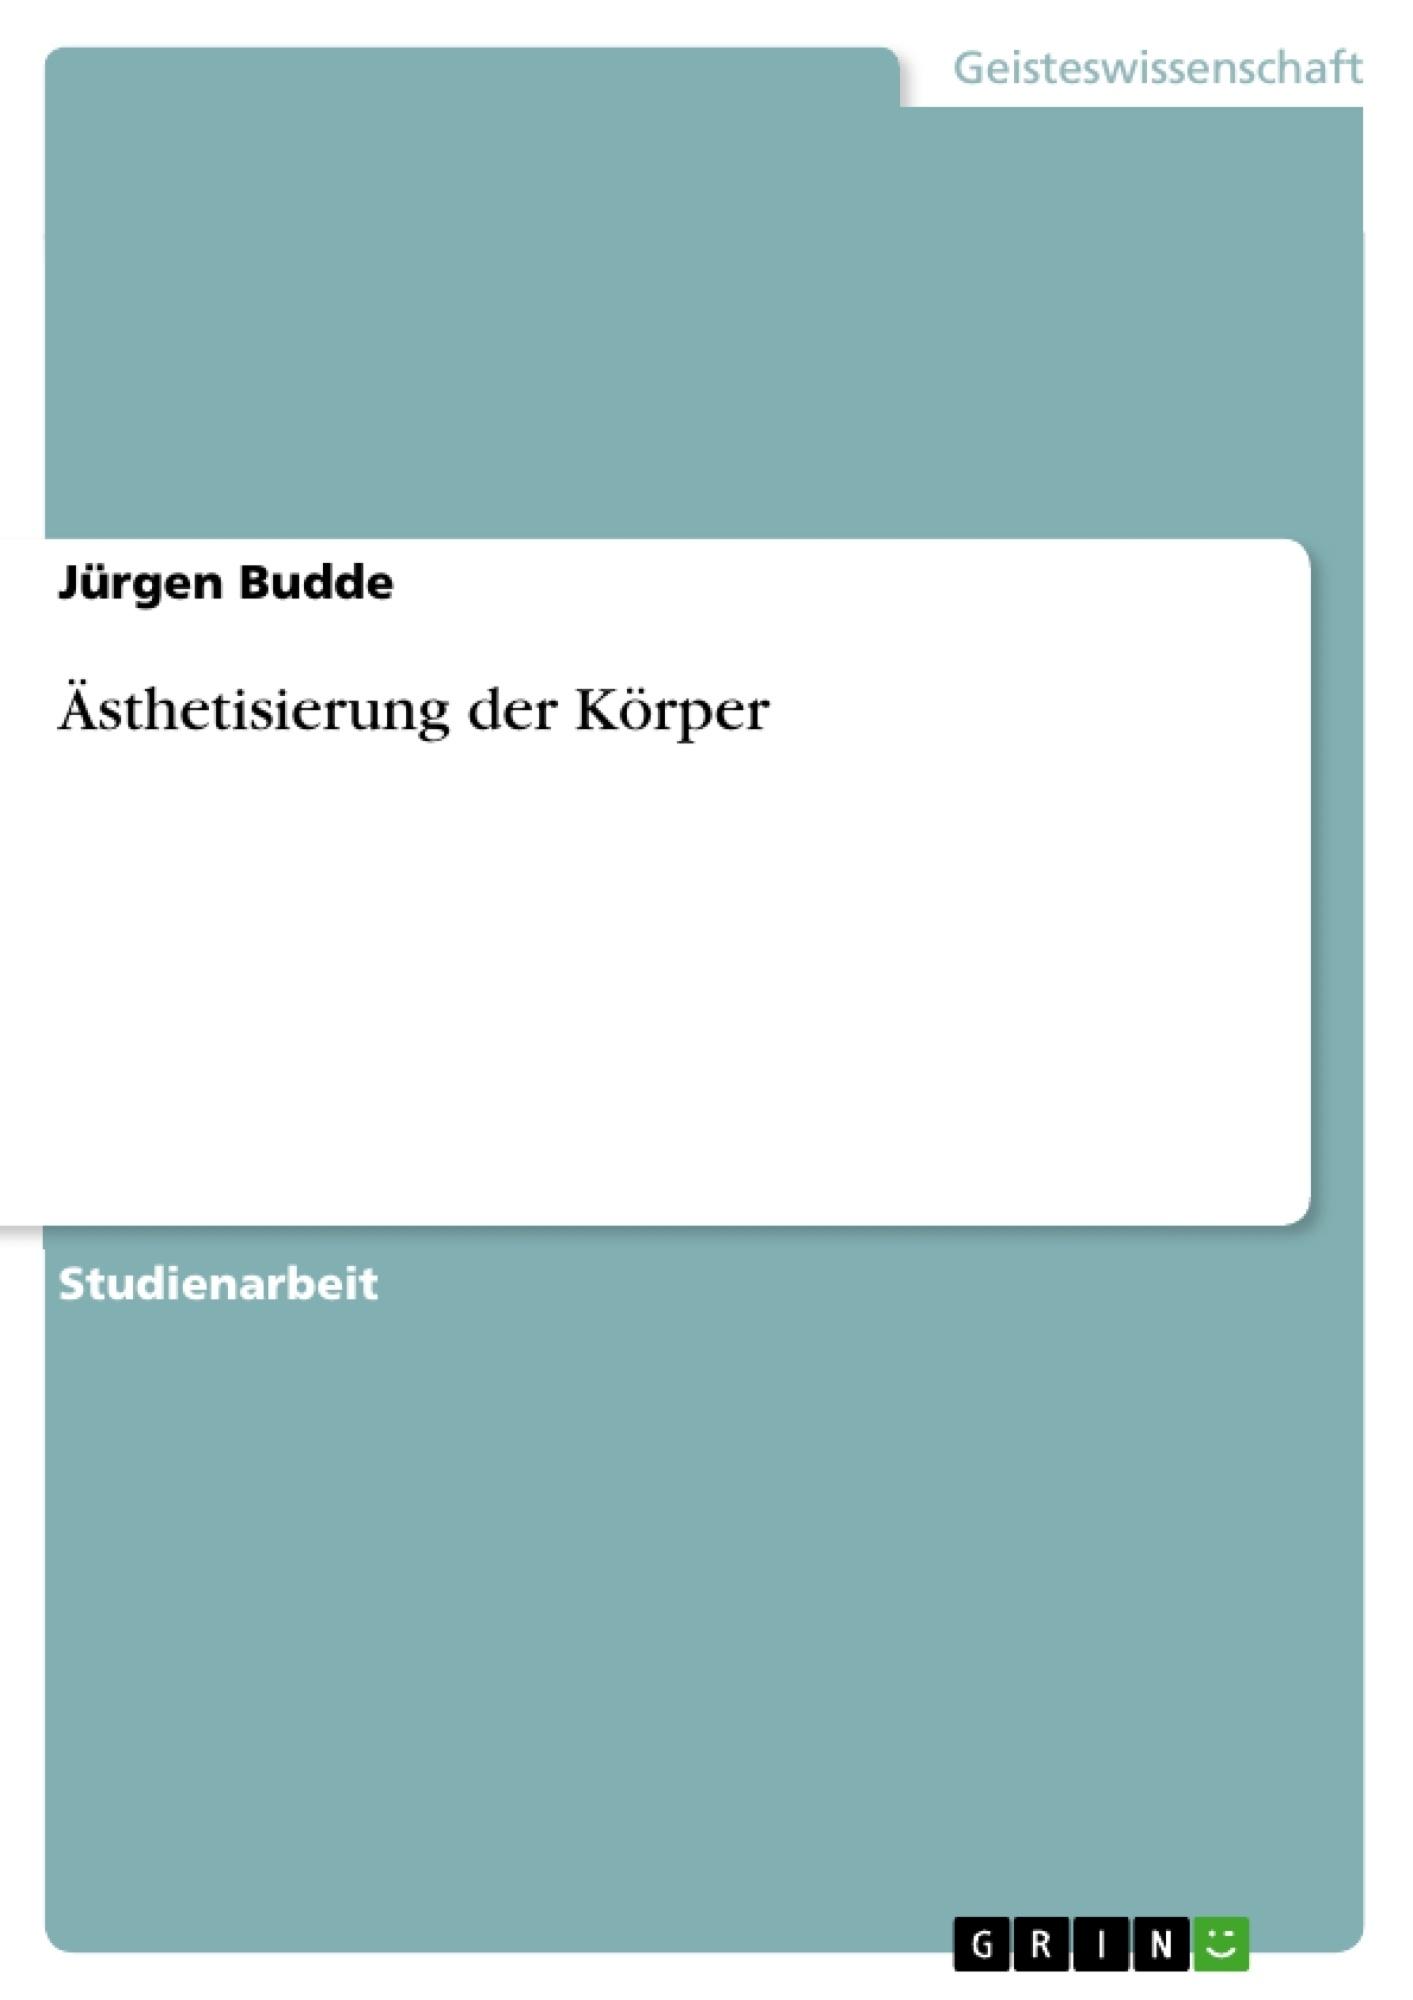 Titel: Ästhetisierung der Körper